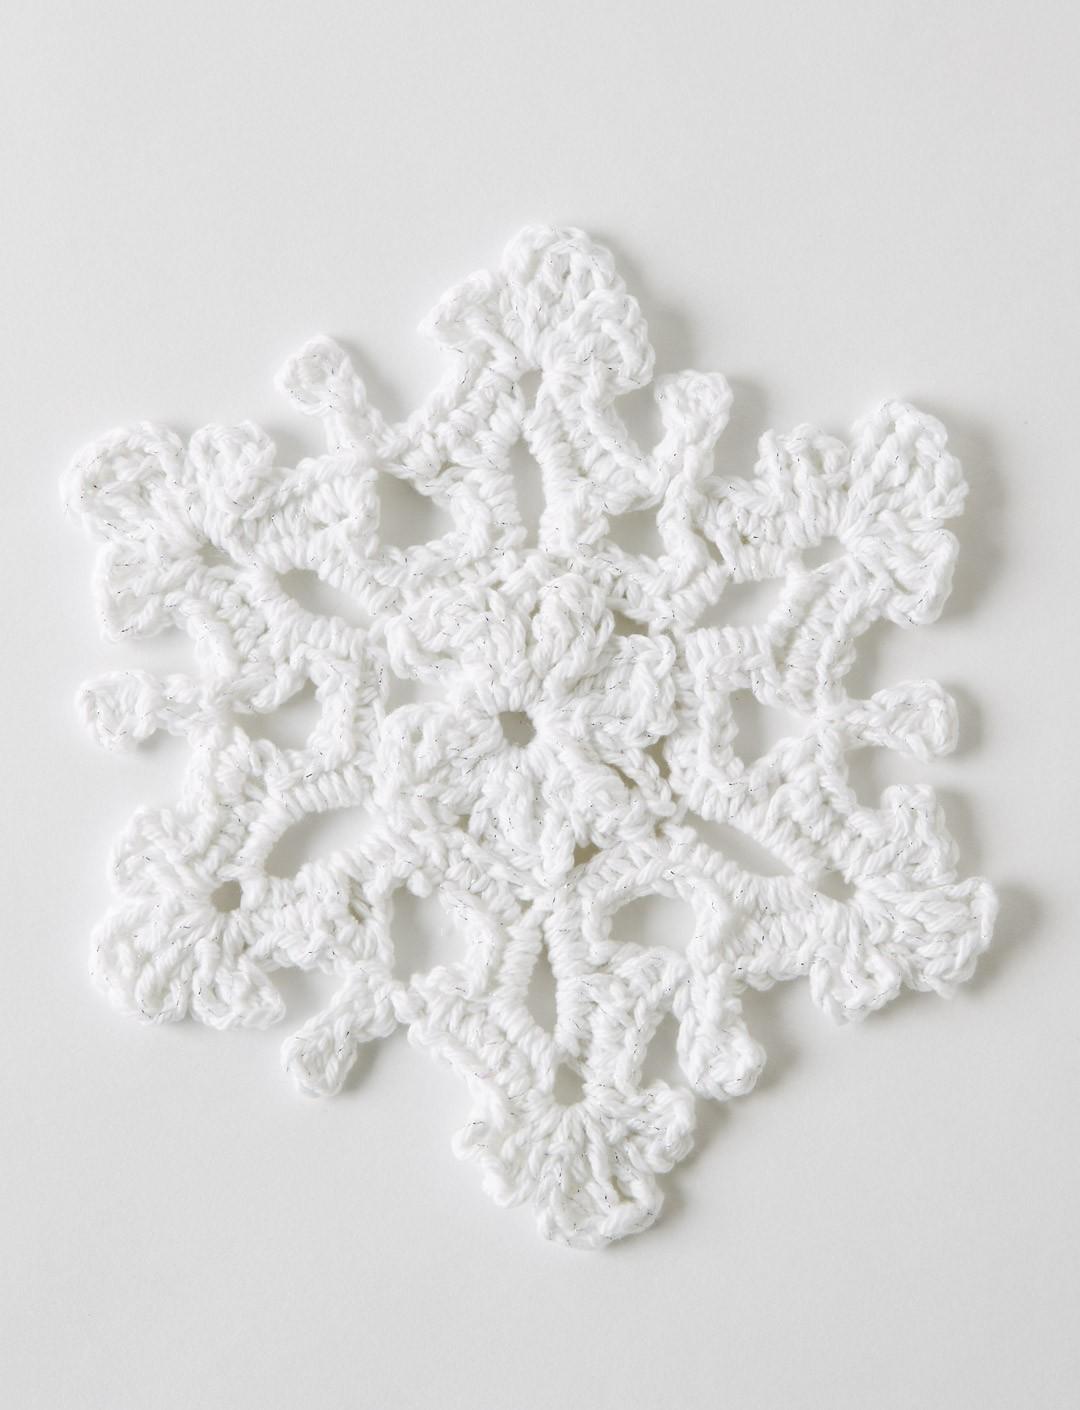 Crochet Twinkling Snowflake #1 + Tutorial - The Crochet Crowd